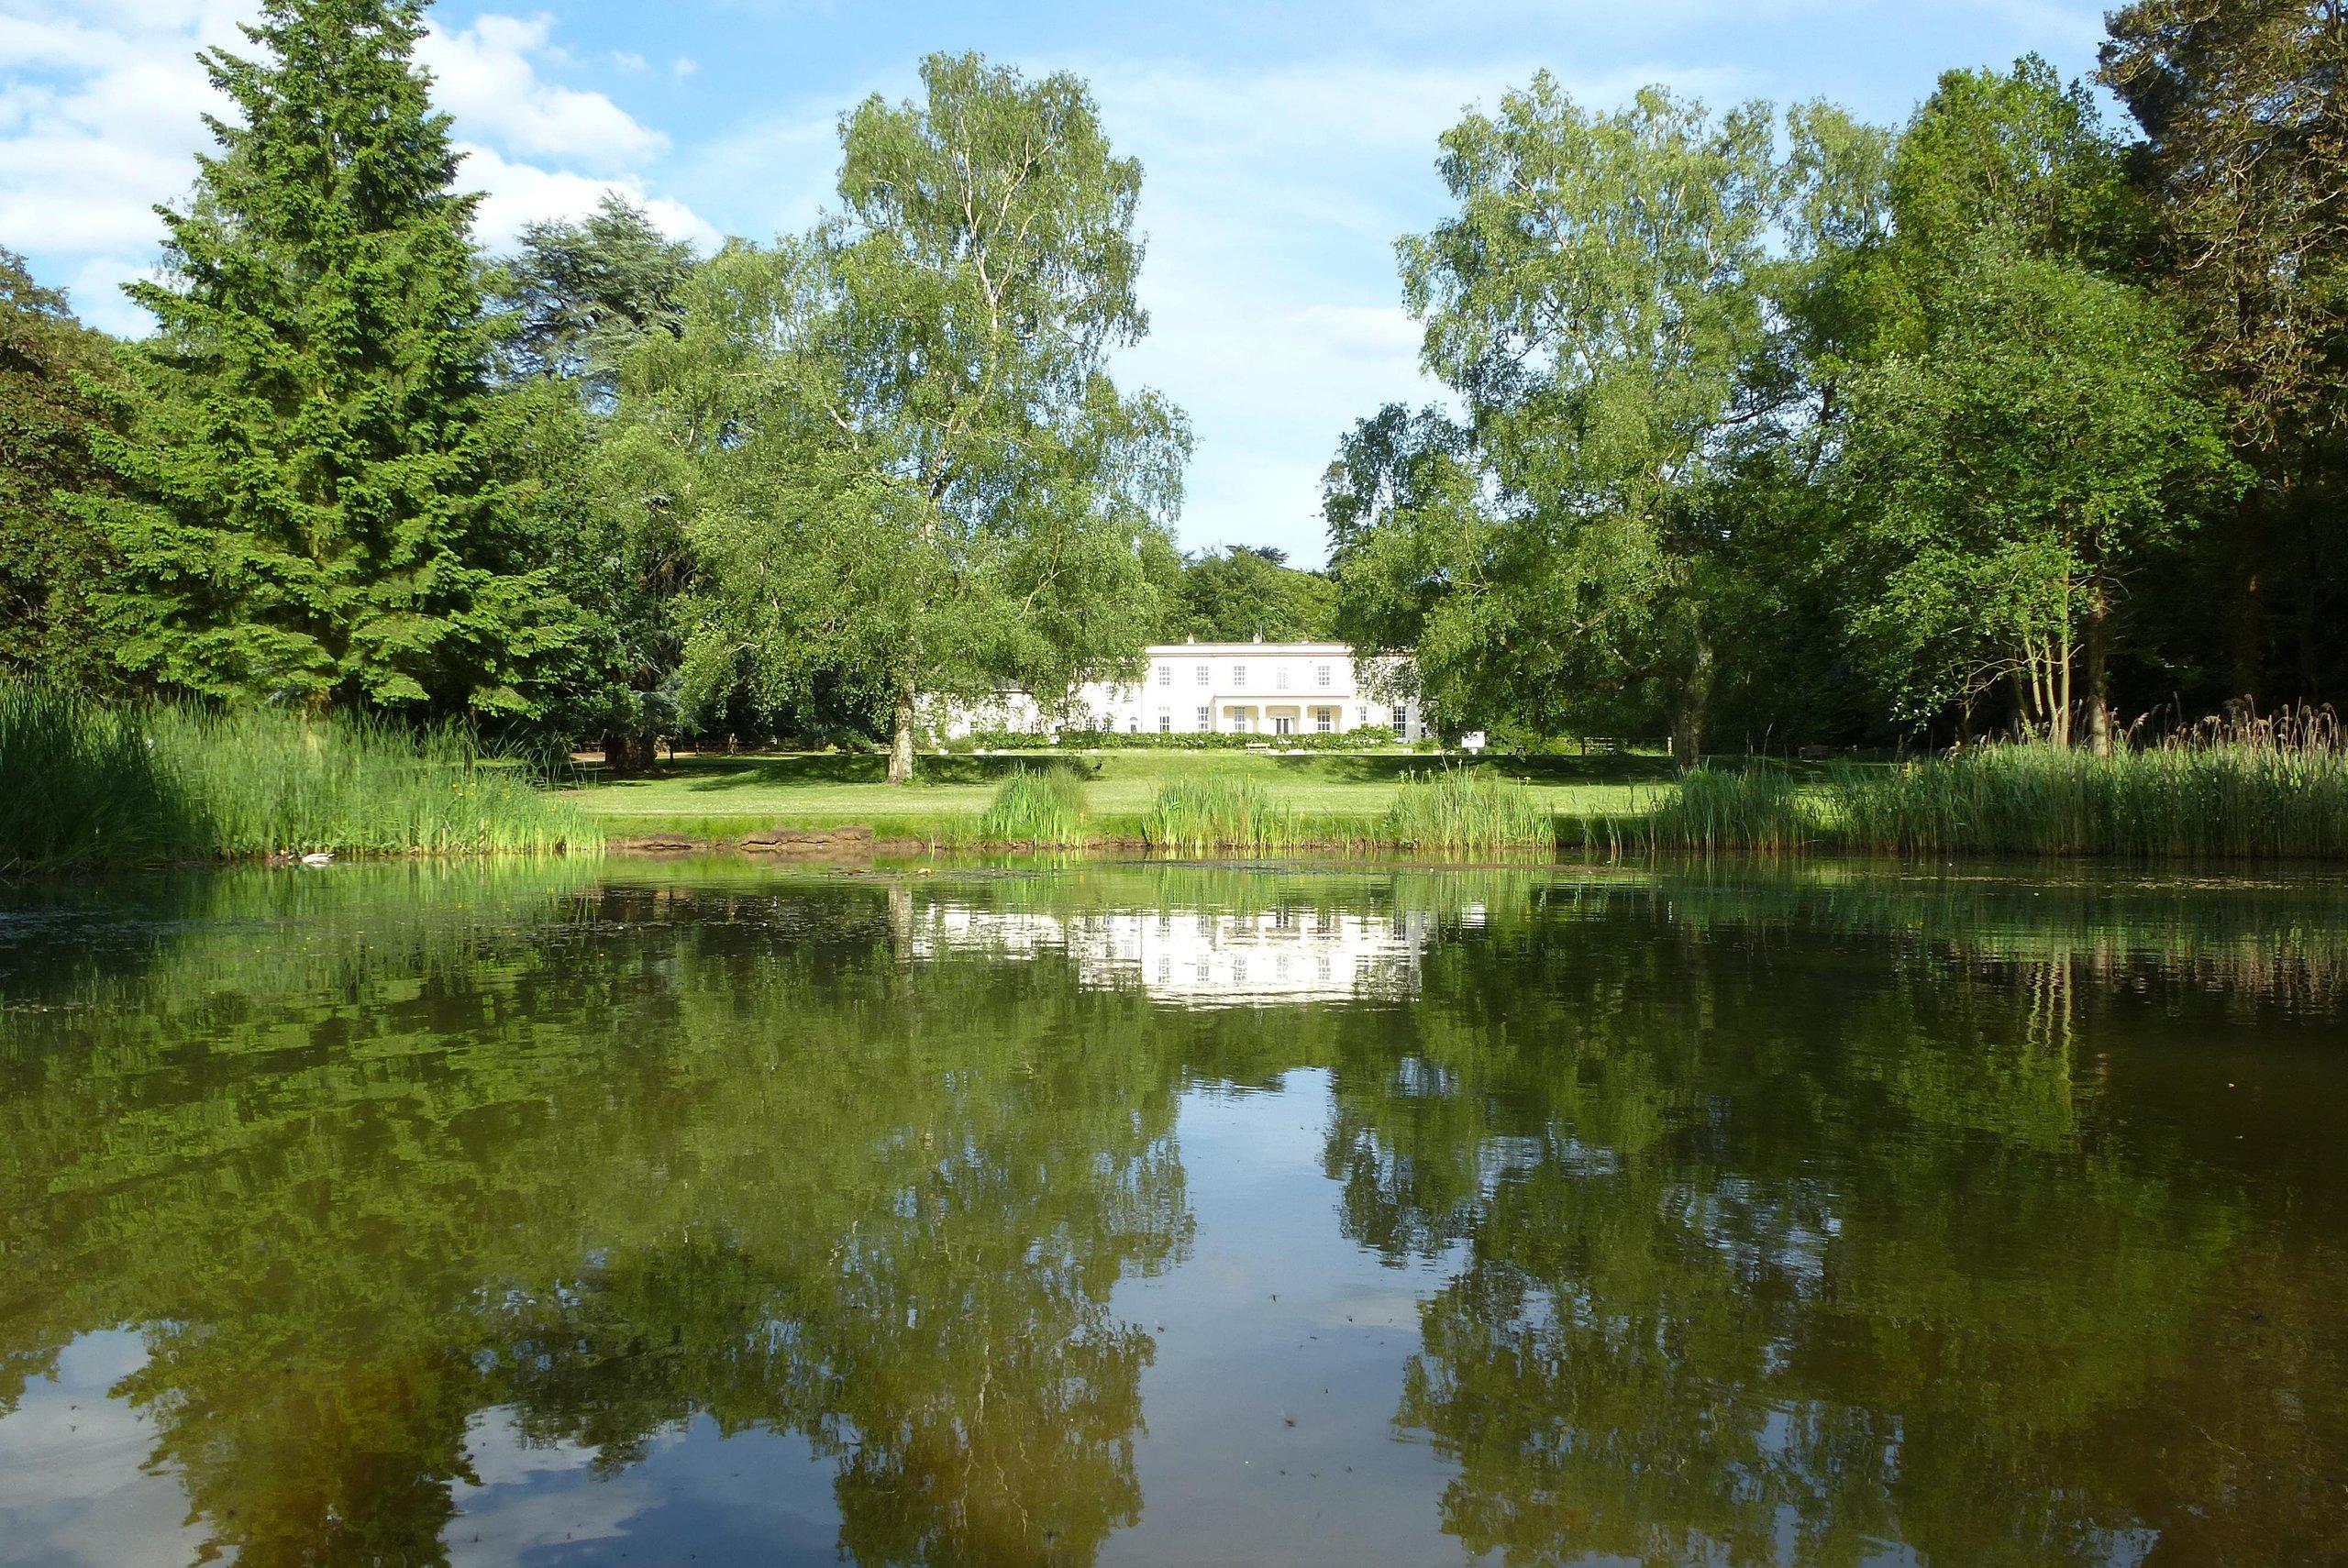 brandon, england: tourismus in brandon - tripadvisor